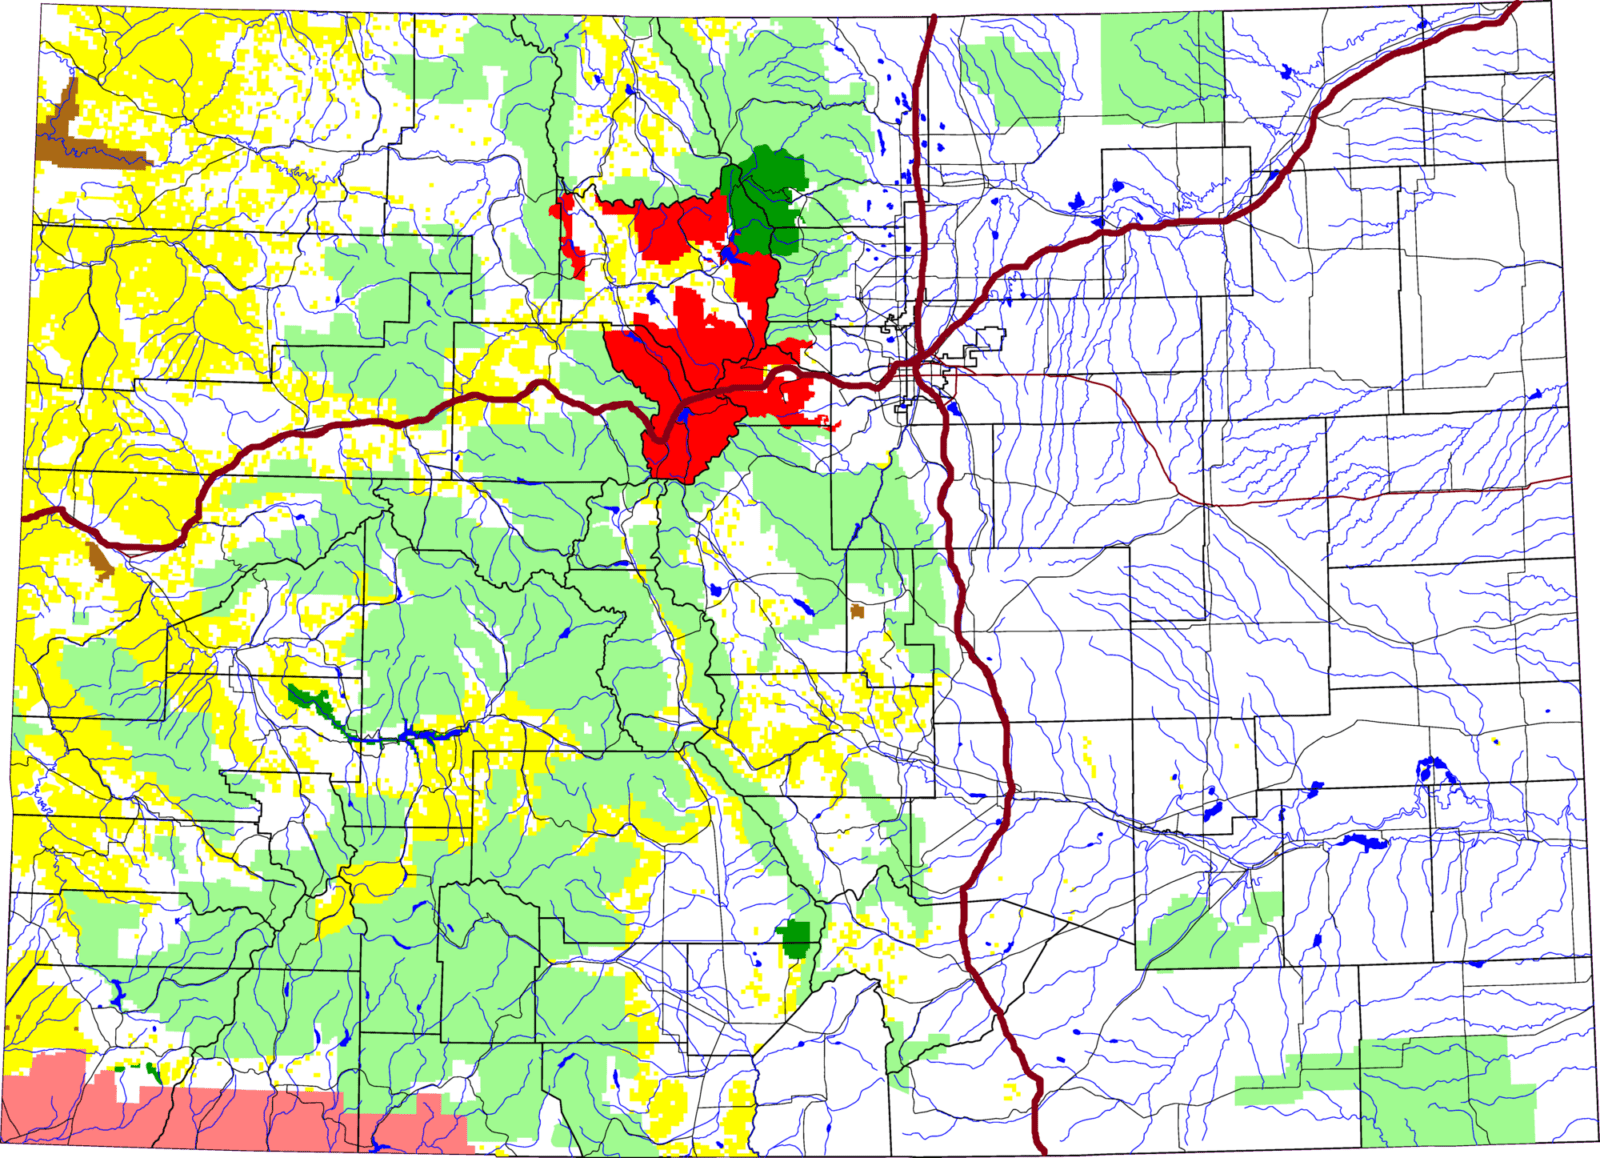 shawnee national forest trail map pdf